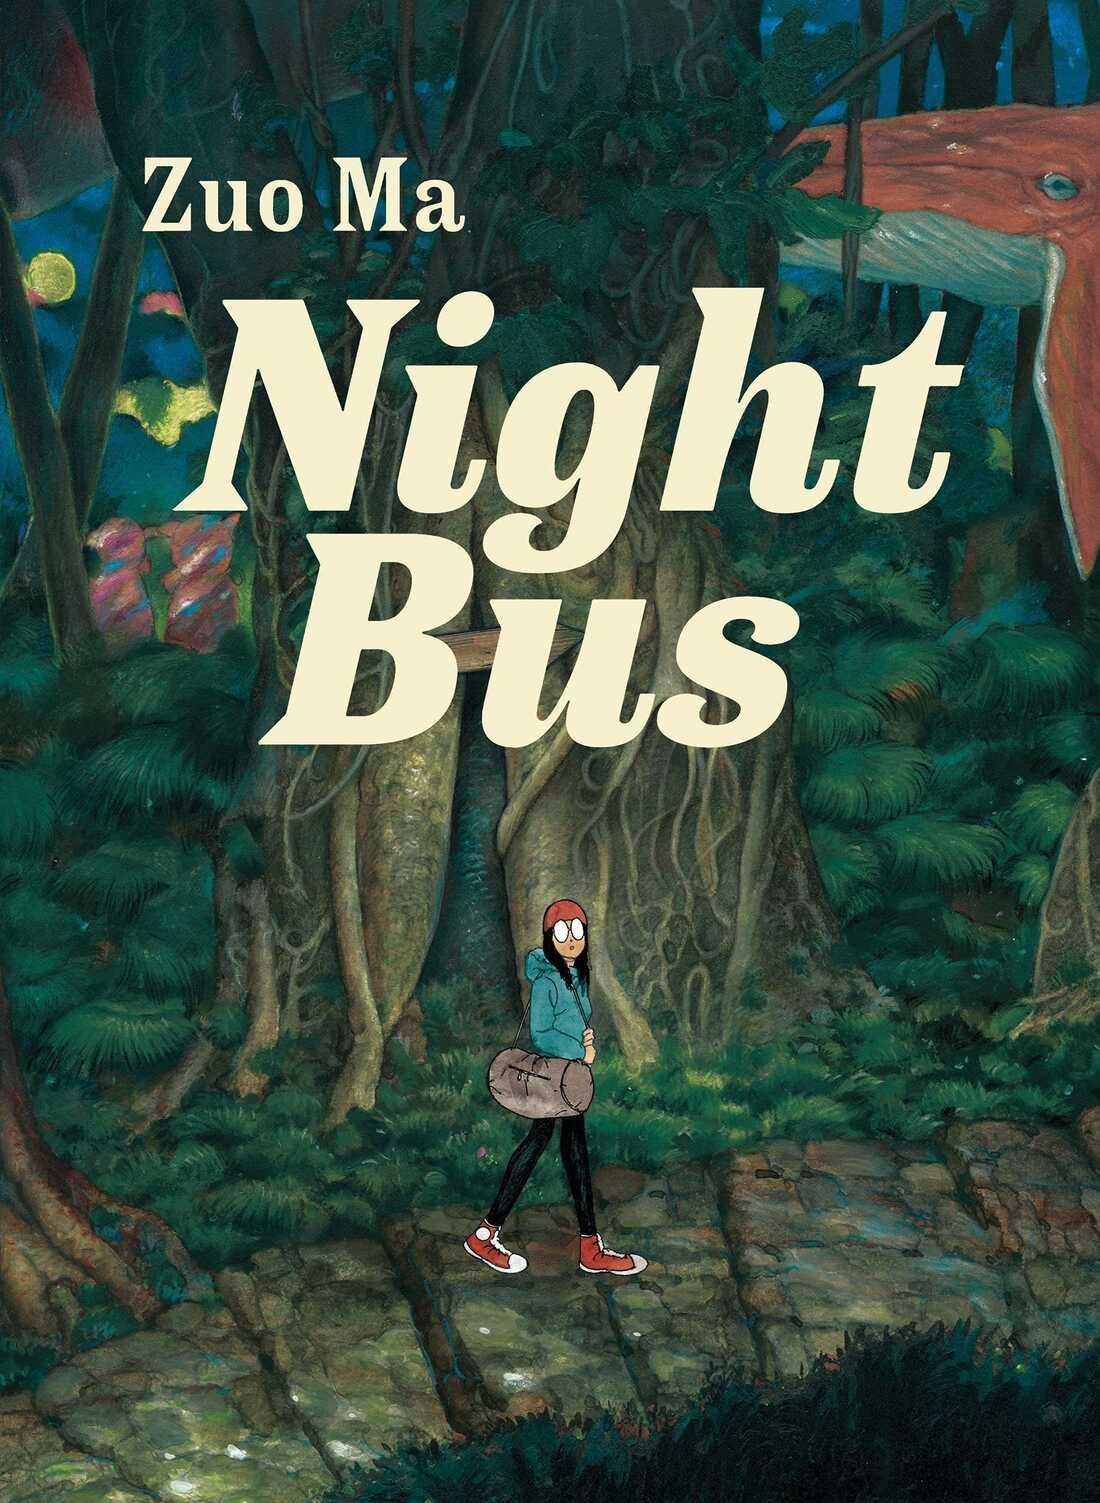 Night Bus, by Zuo Ma